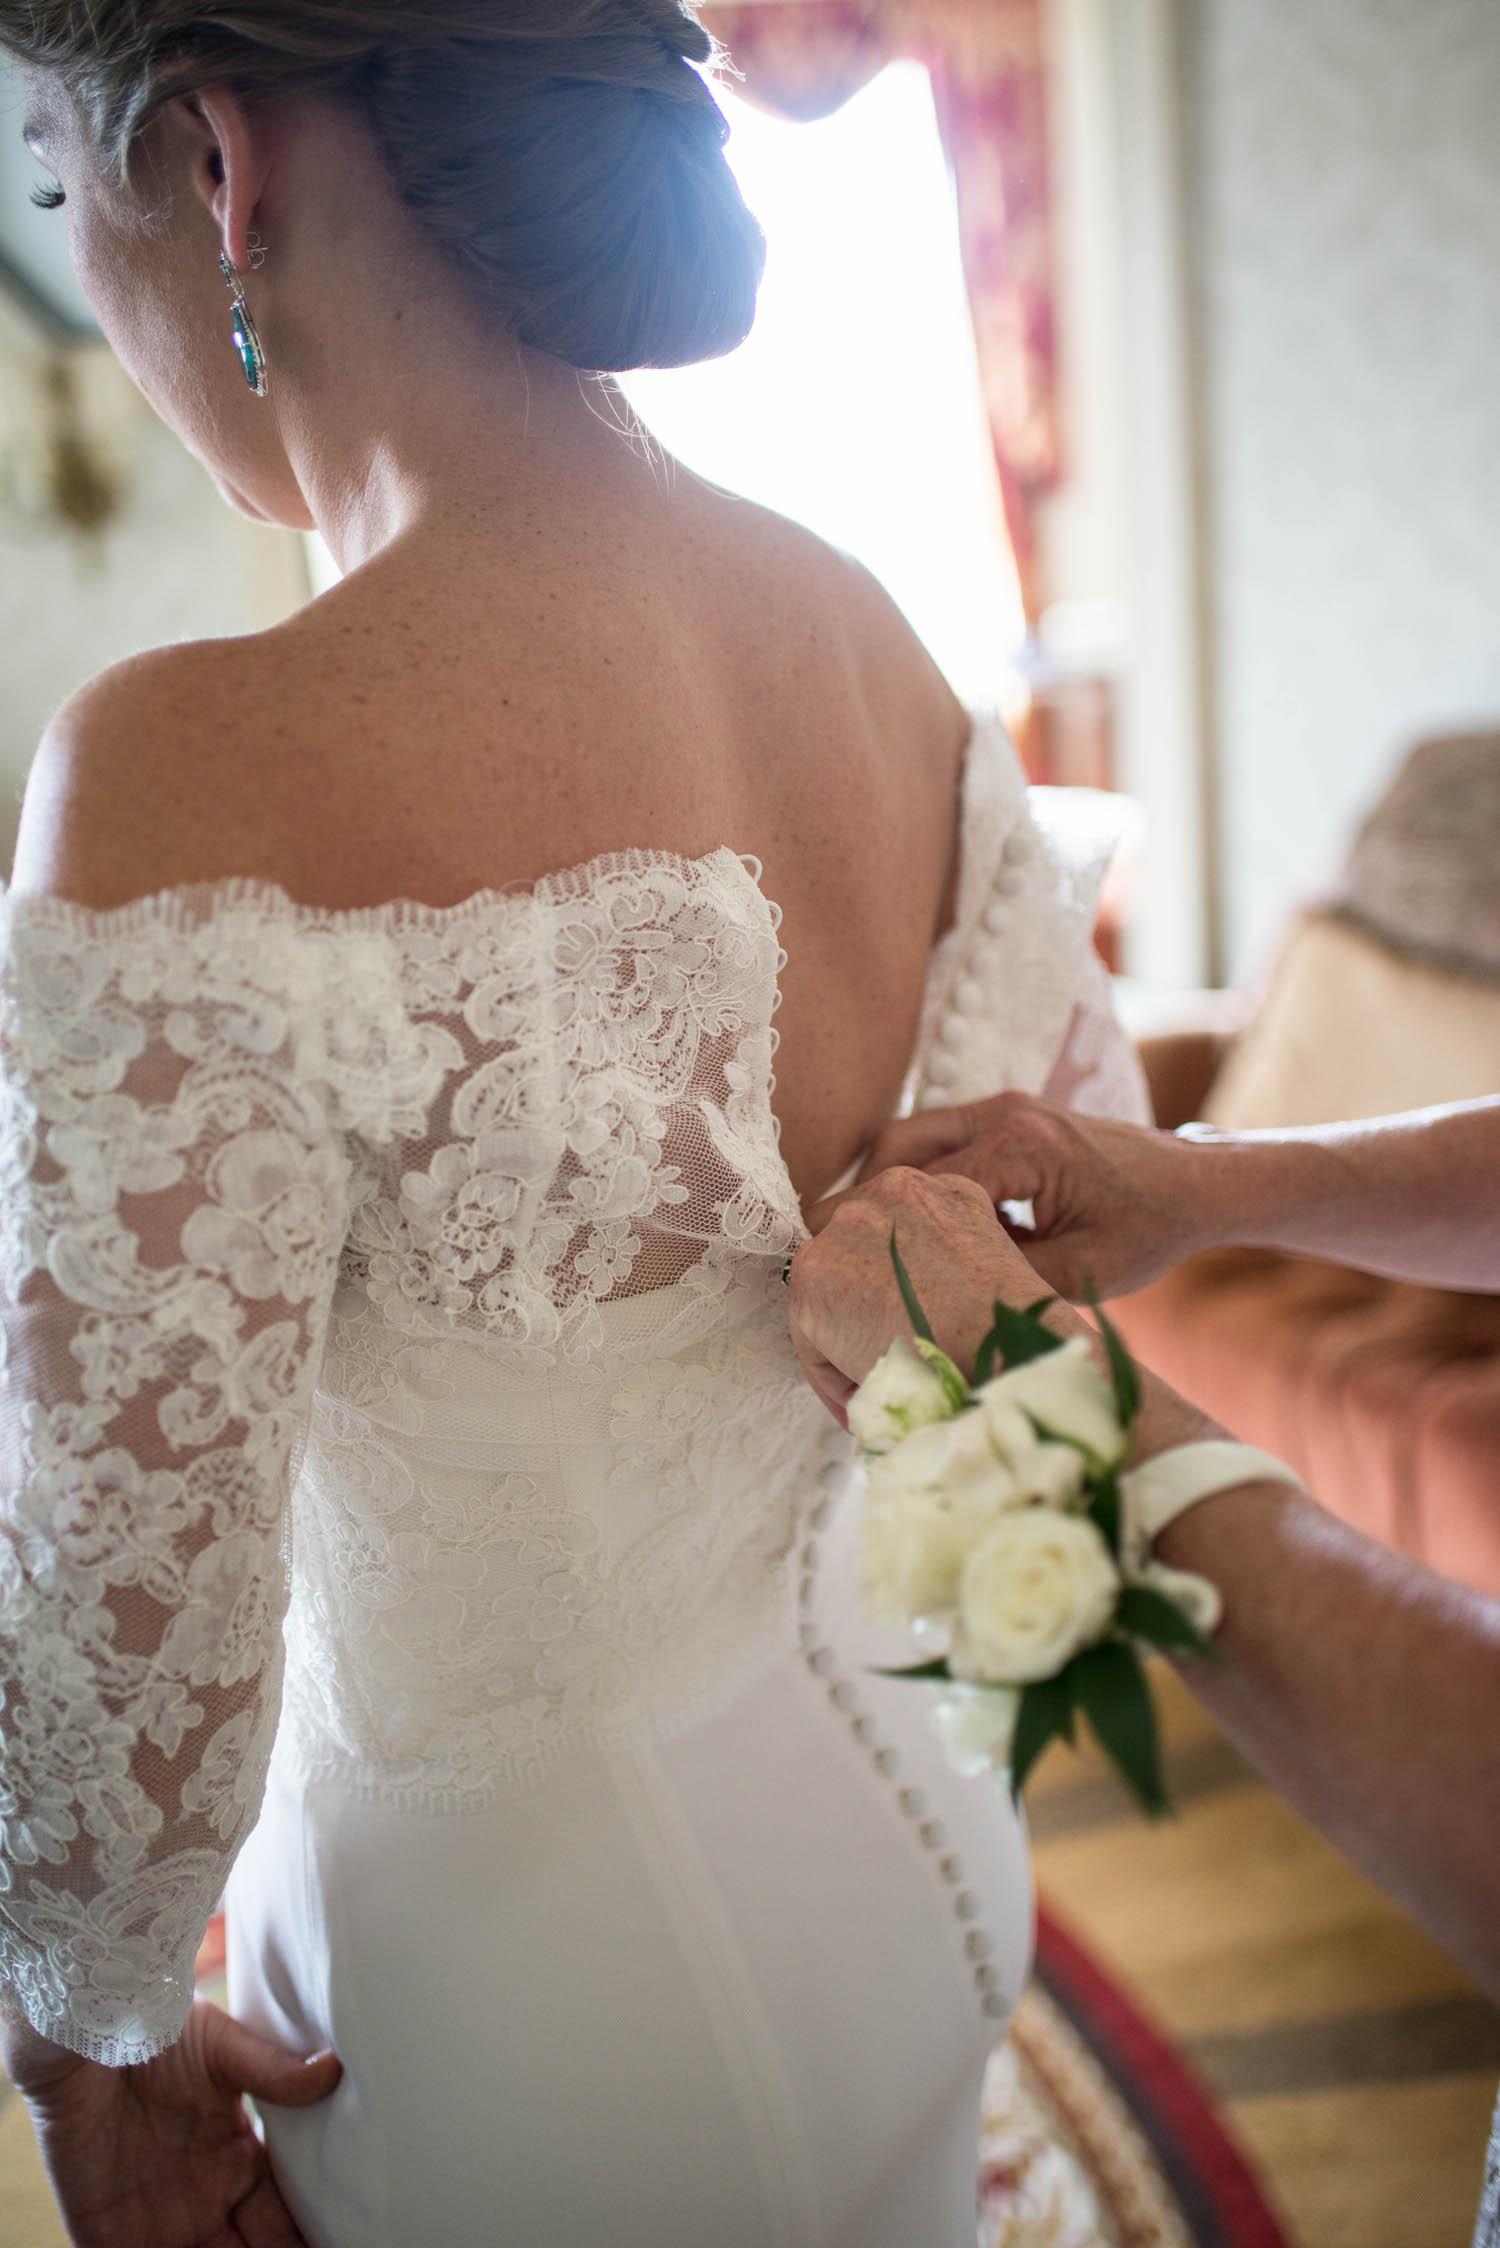 Washington DC Wedding - Sincerely Pete Events - Erin Tetterton Photography - Bride Getting Ready